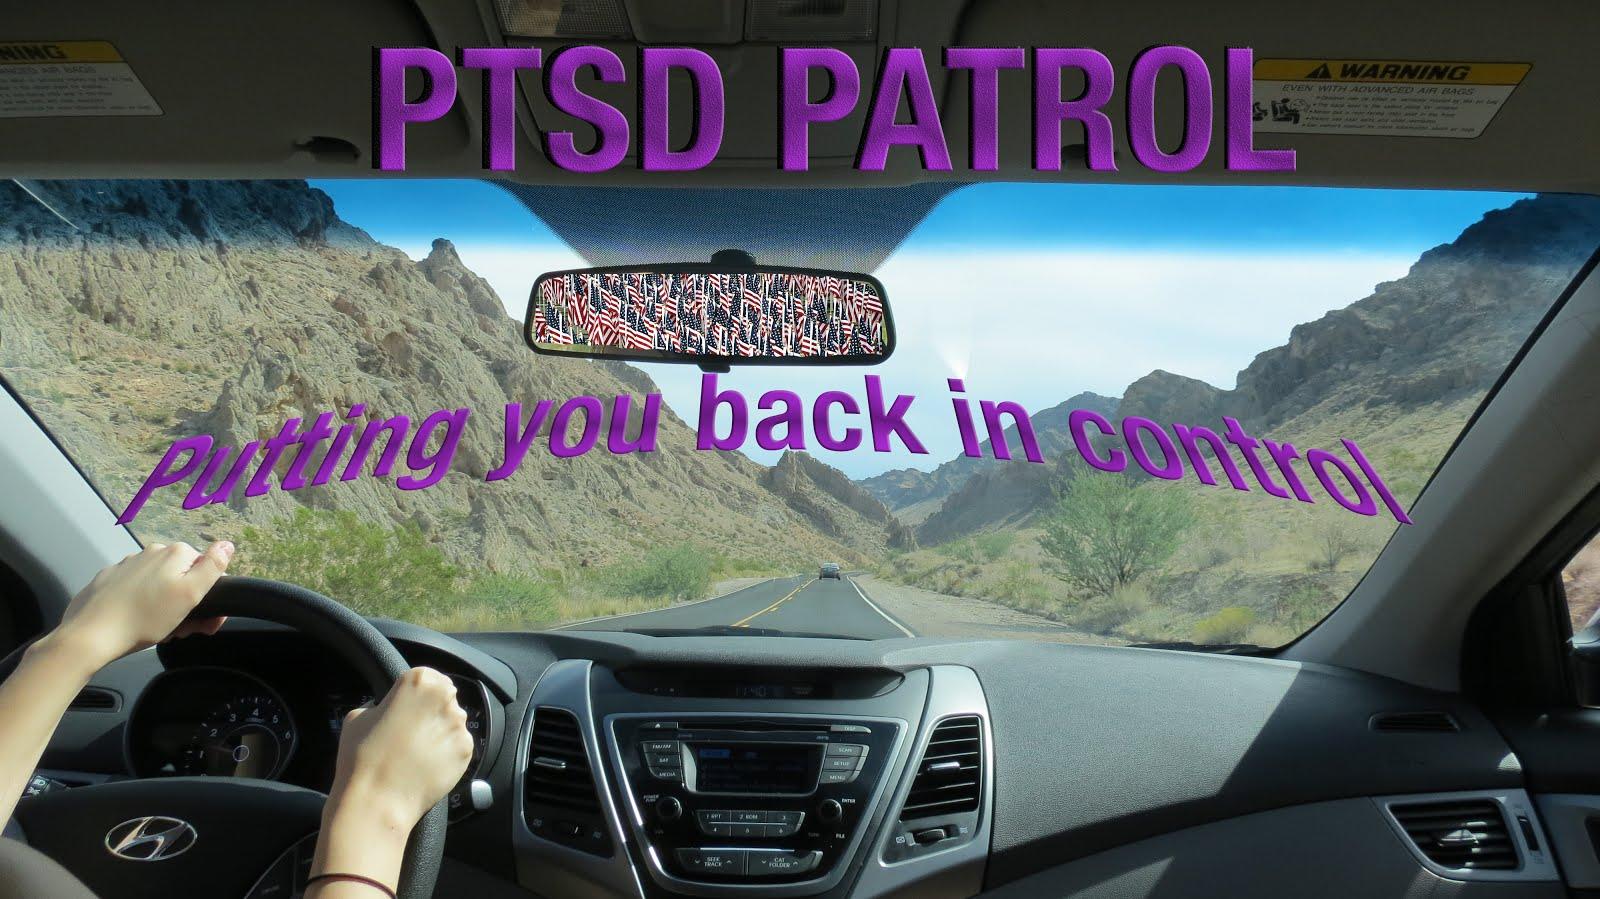 PTSD Patrol Facebook